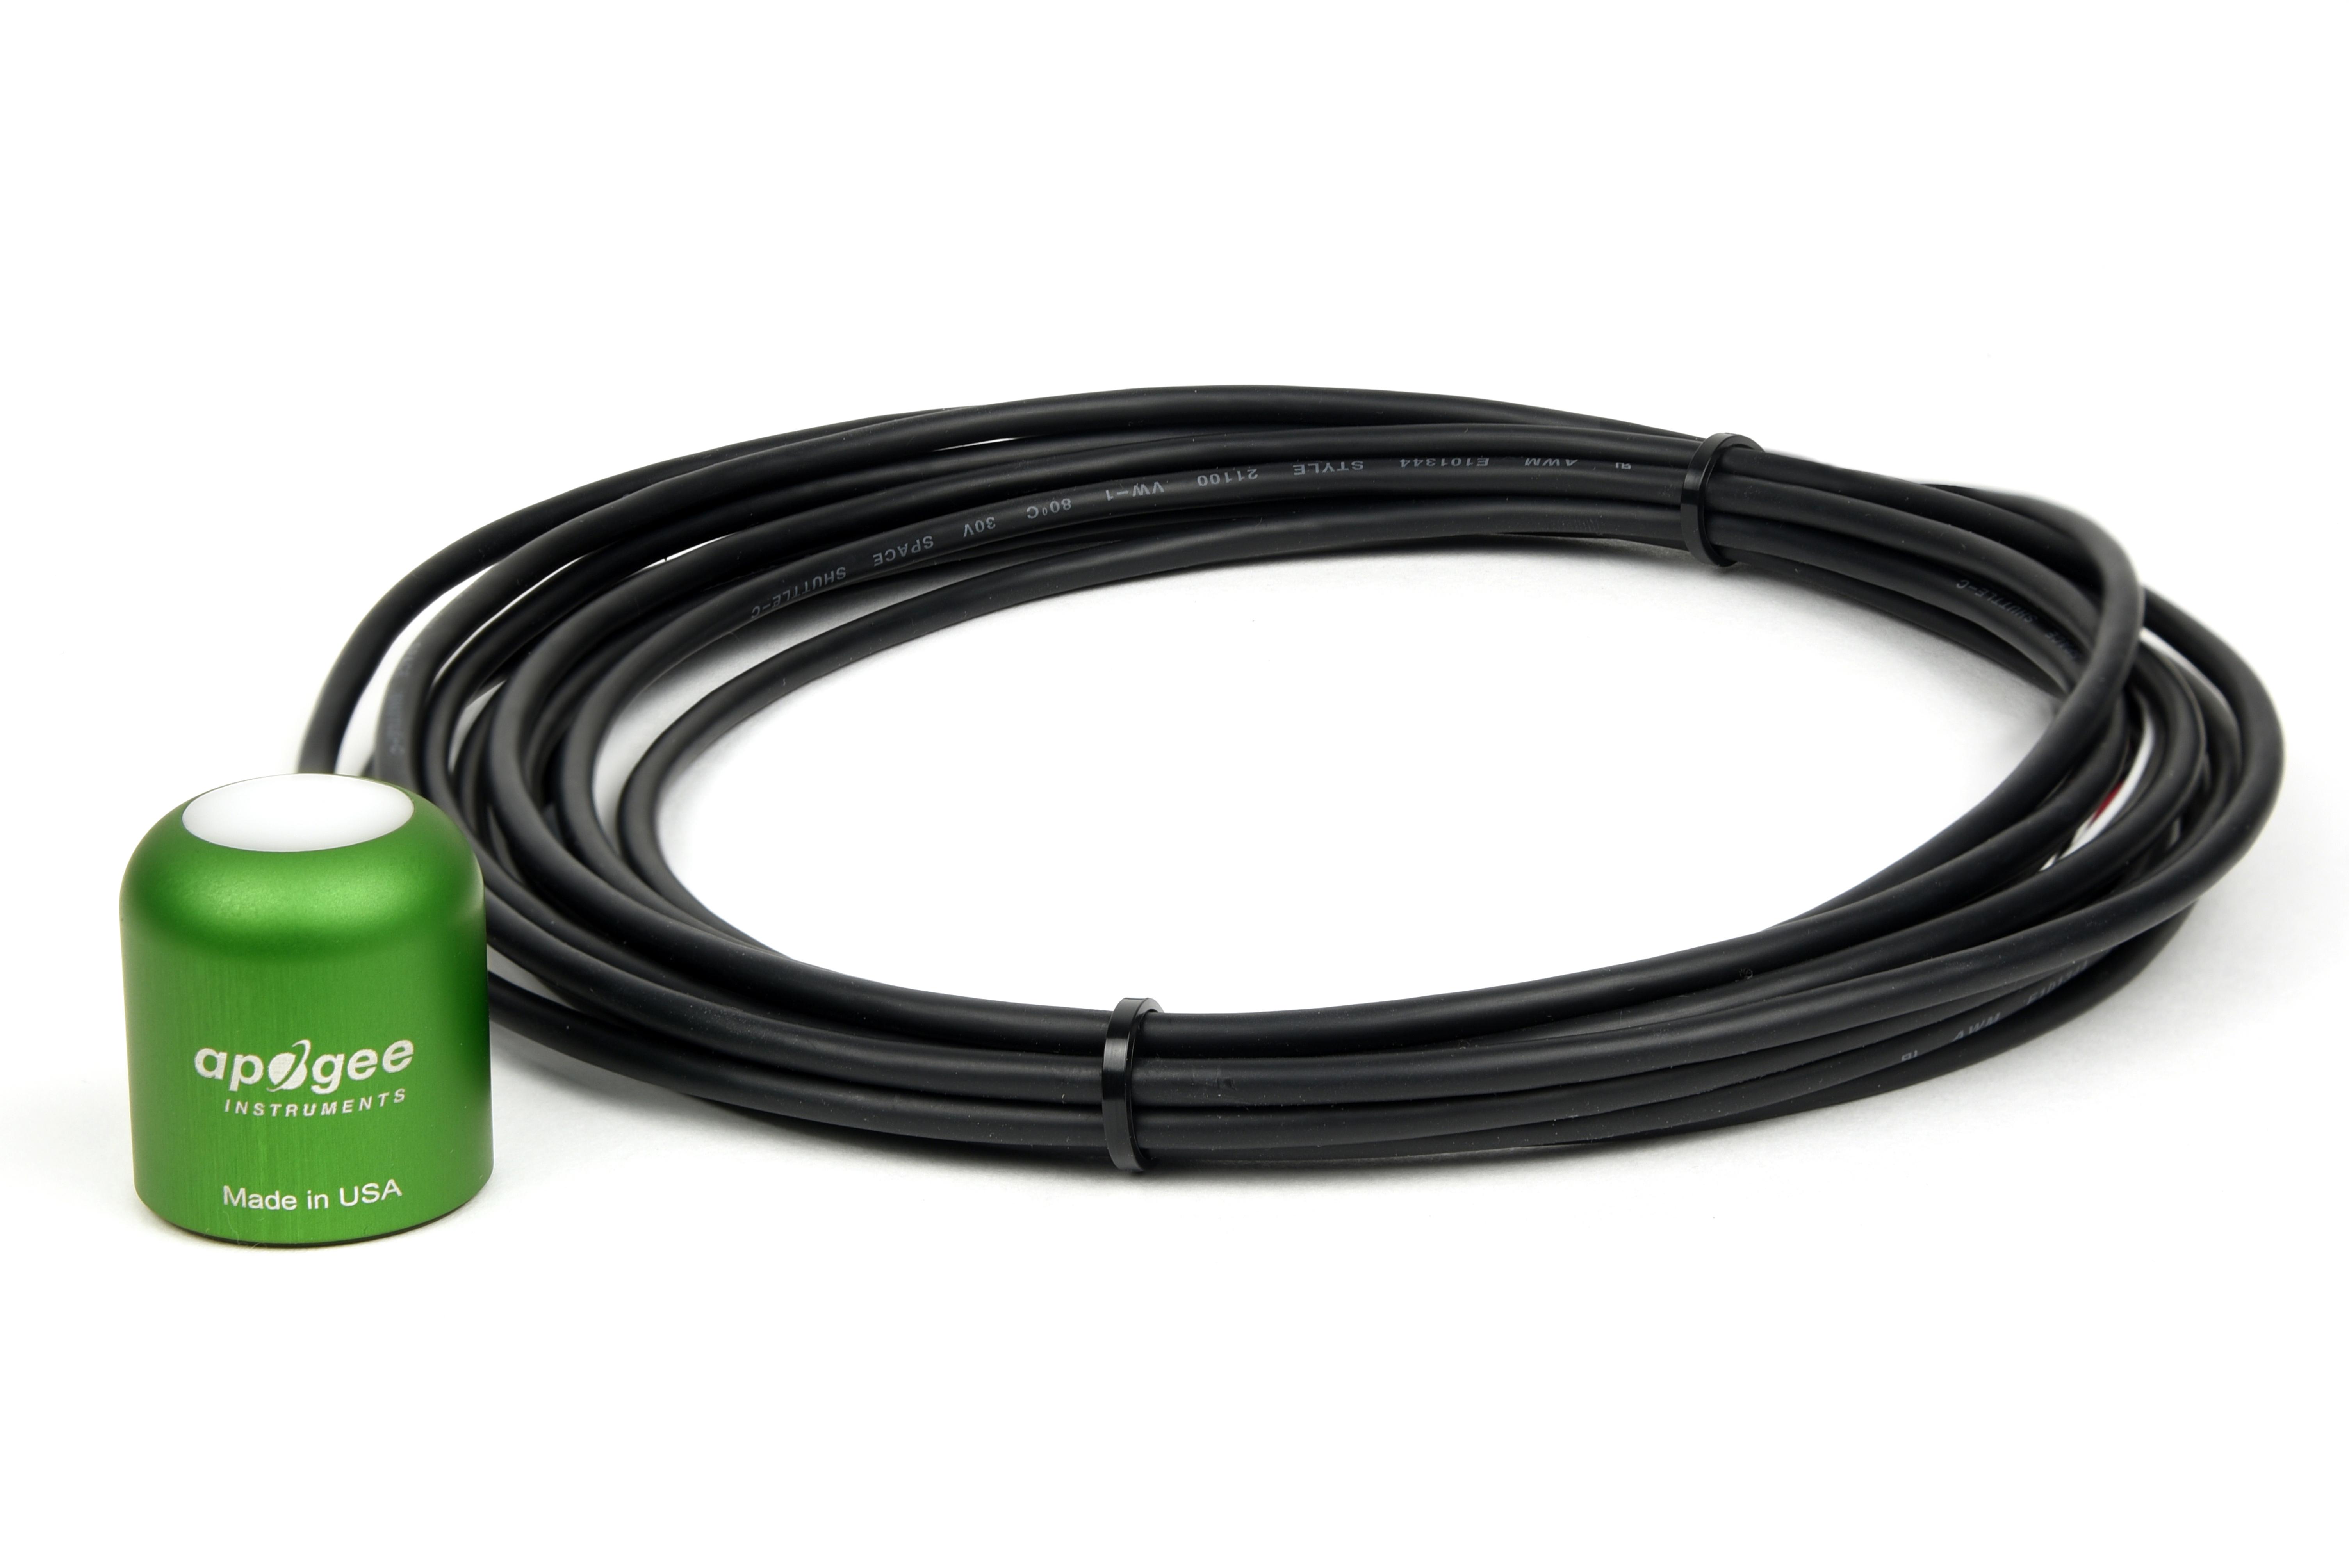 Apogee SE-205 Photometric Sensor